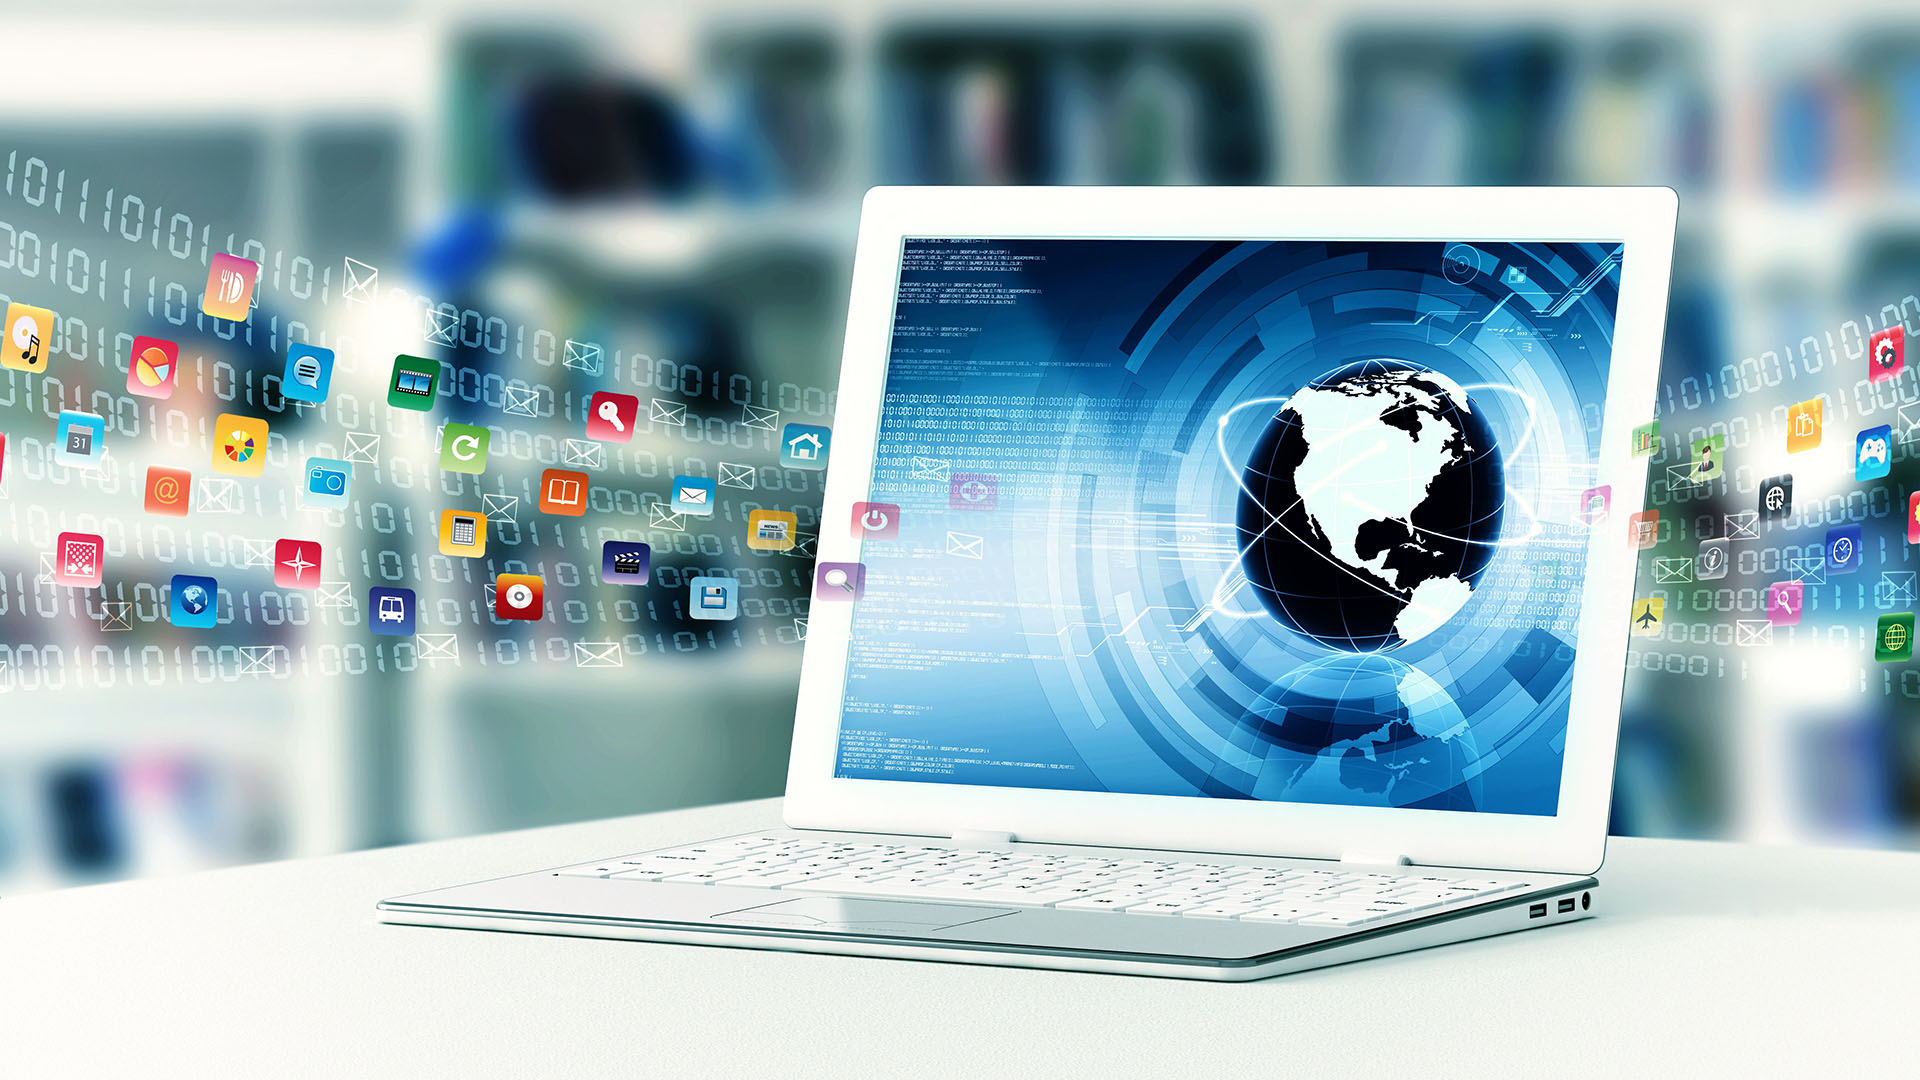 20140217-laptop-internet-websites